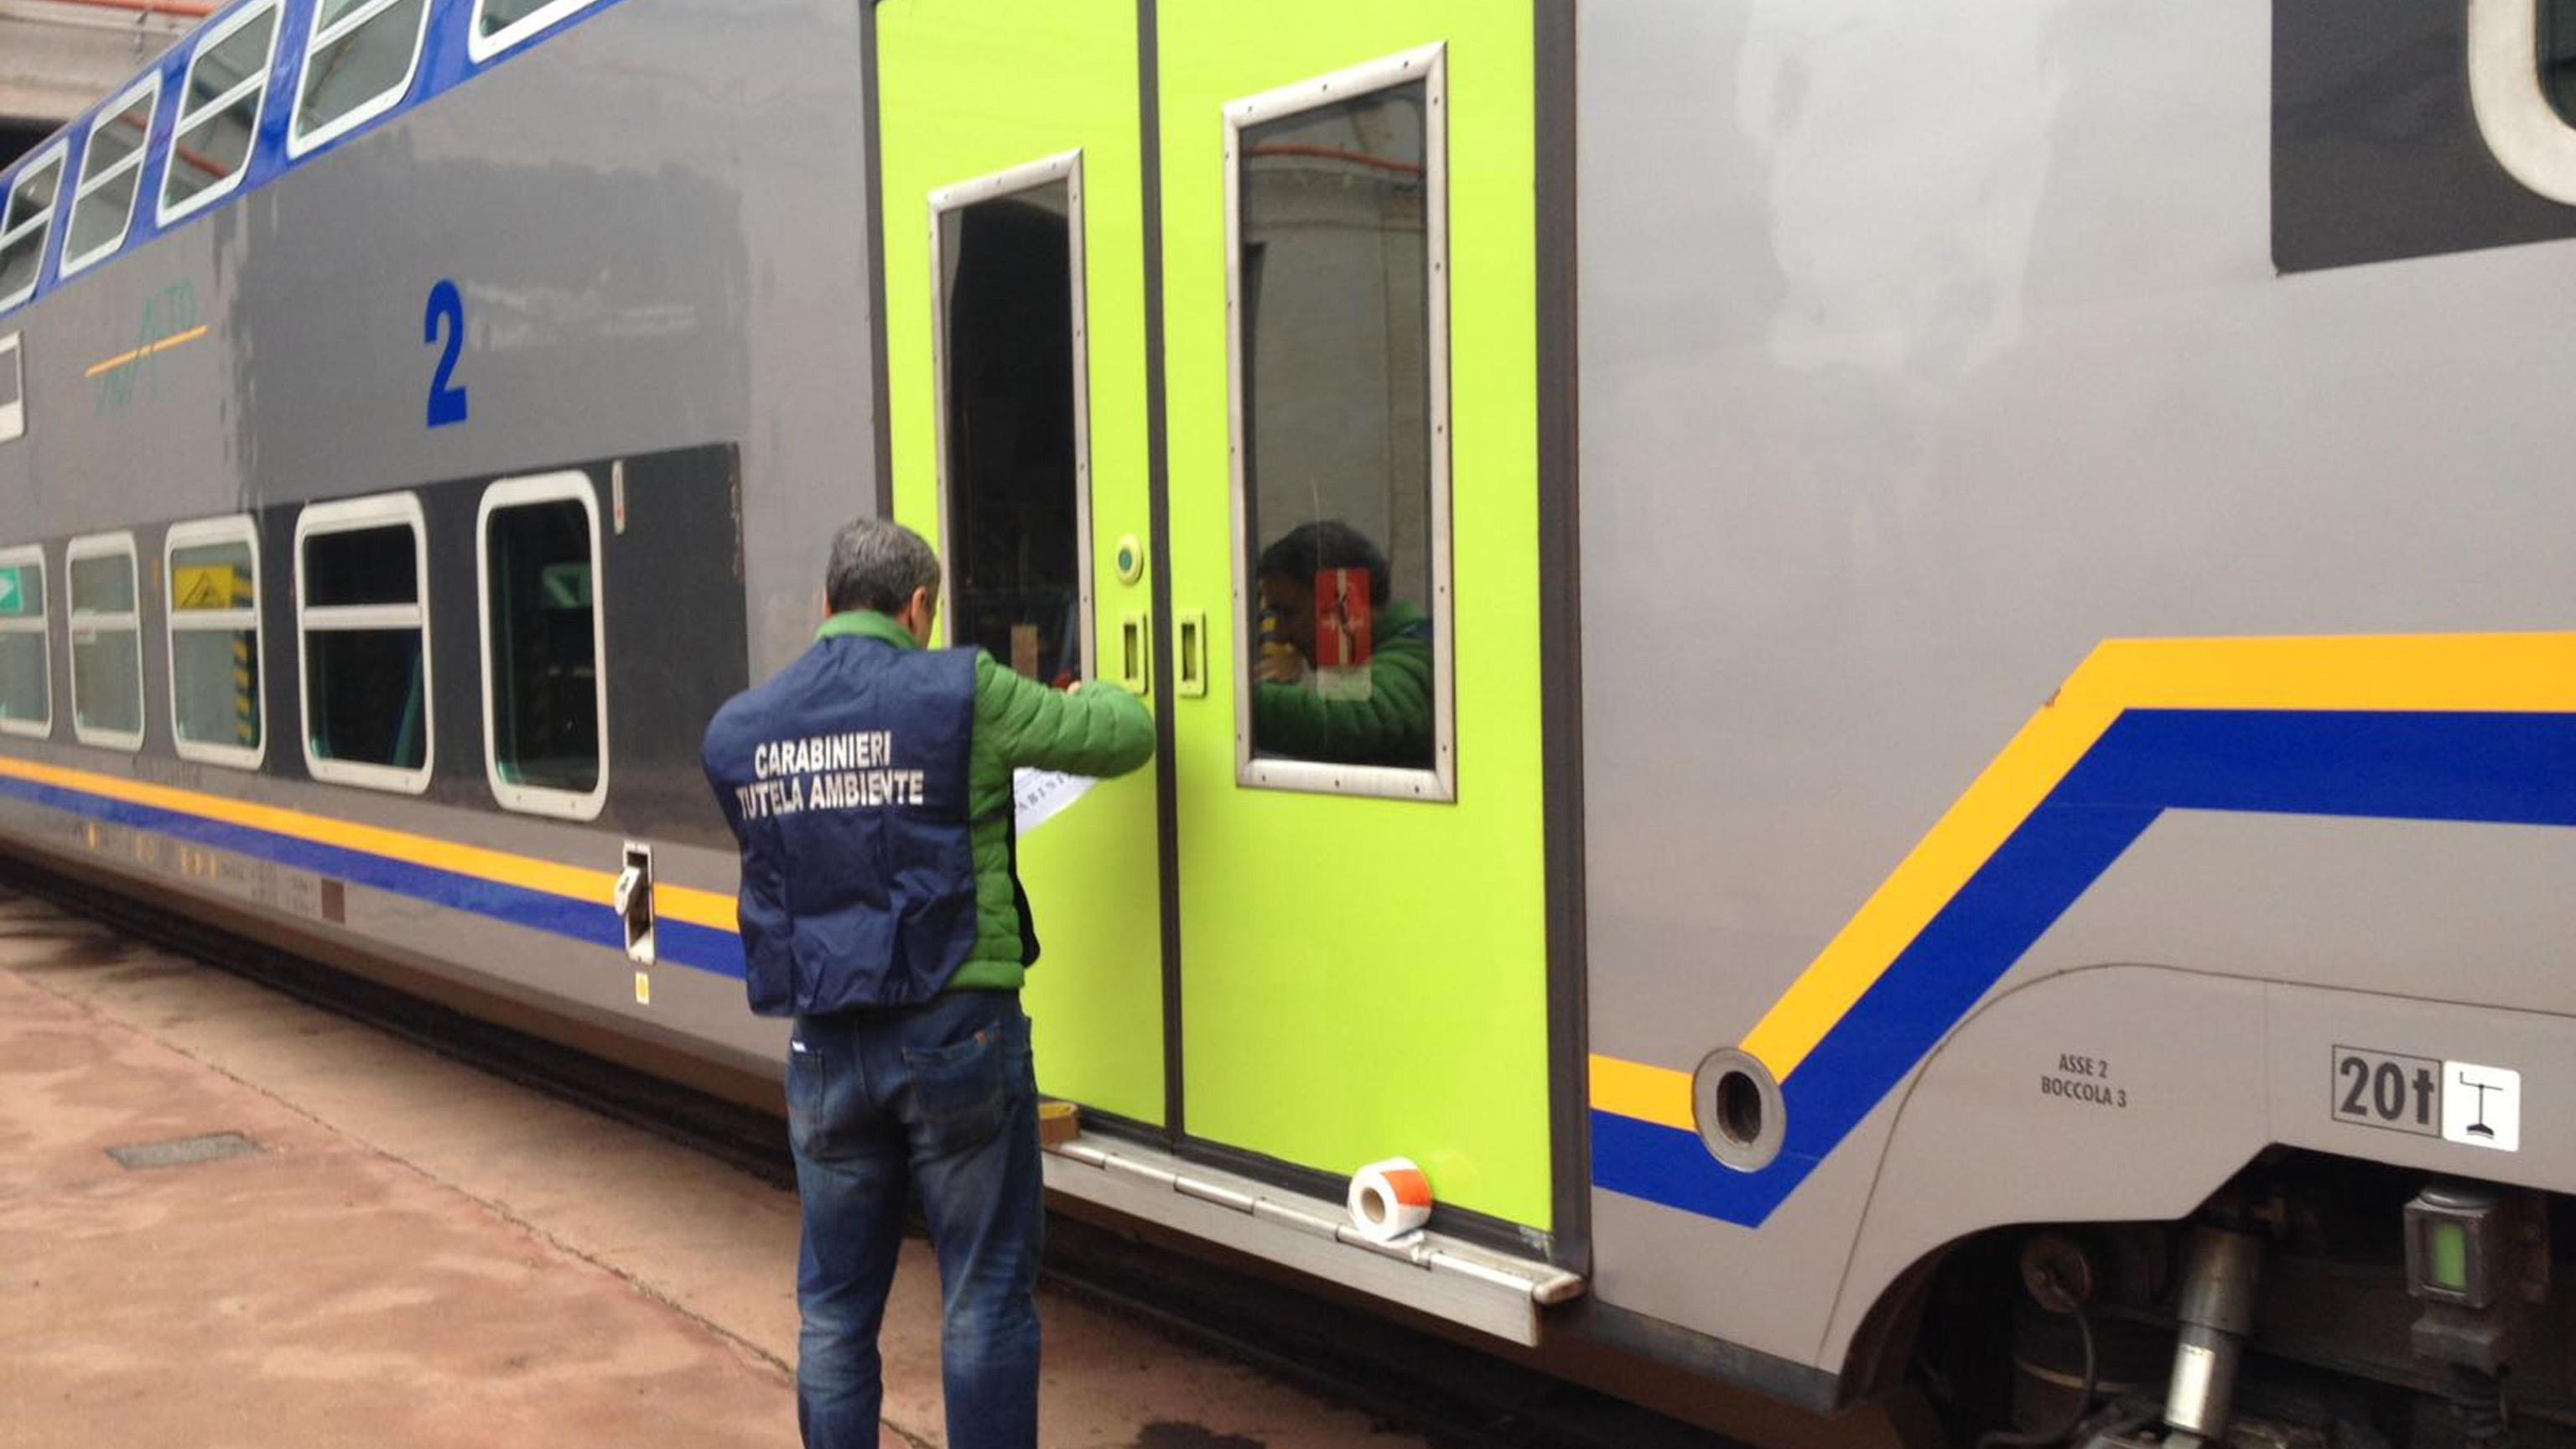 Reflui treni su binari: chiuse indagini